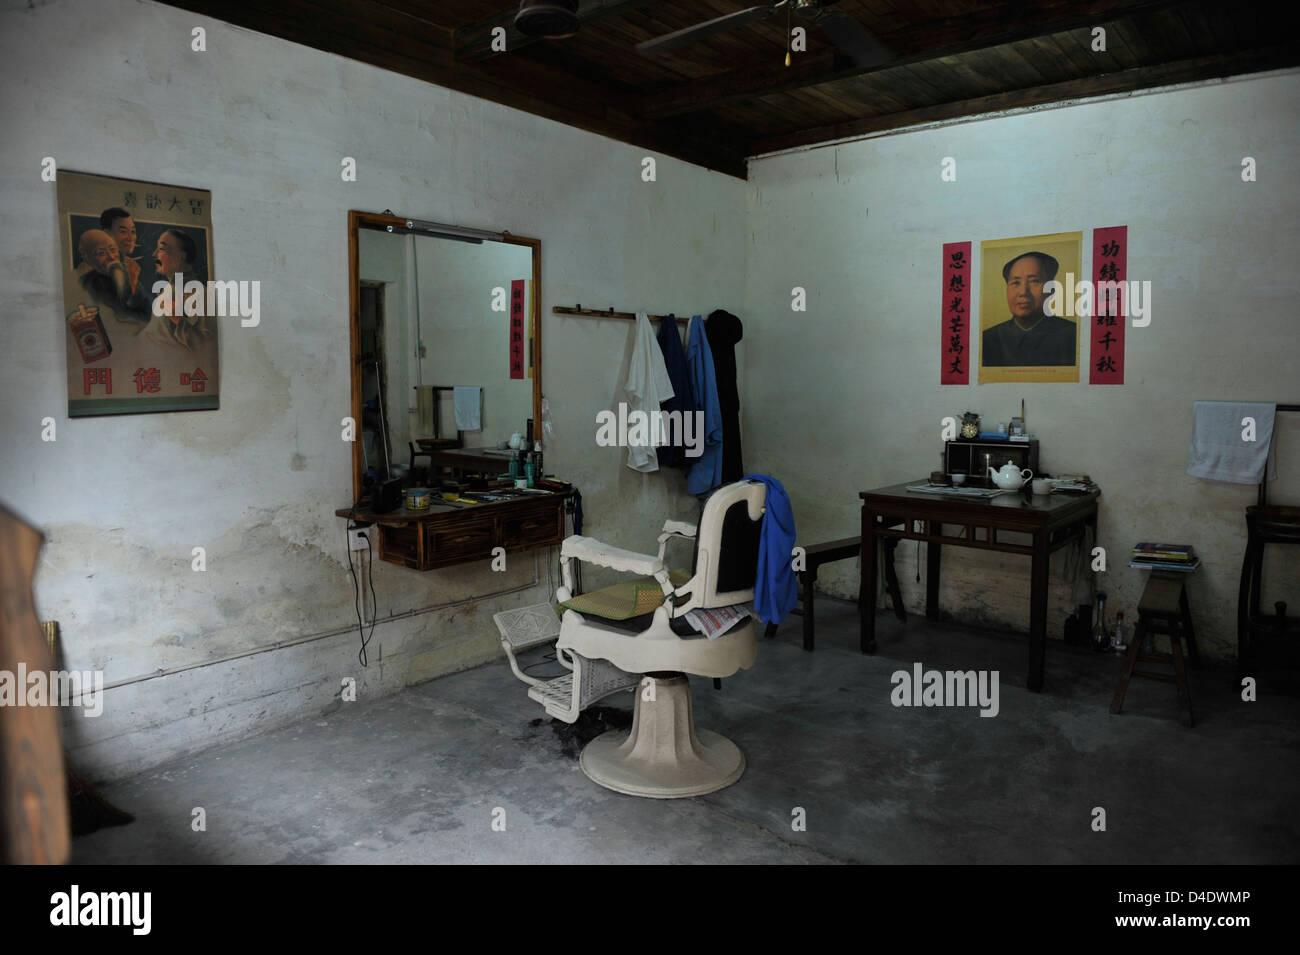 Classic barber shop chairs - Stock Photo Classic Barber Shop In The Old Town Of Zhujiajiao